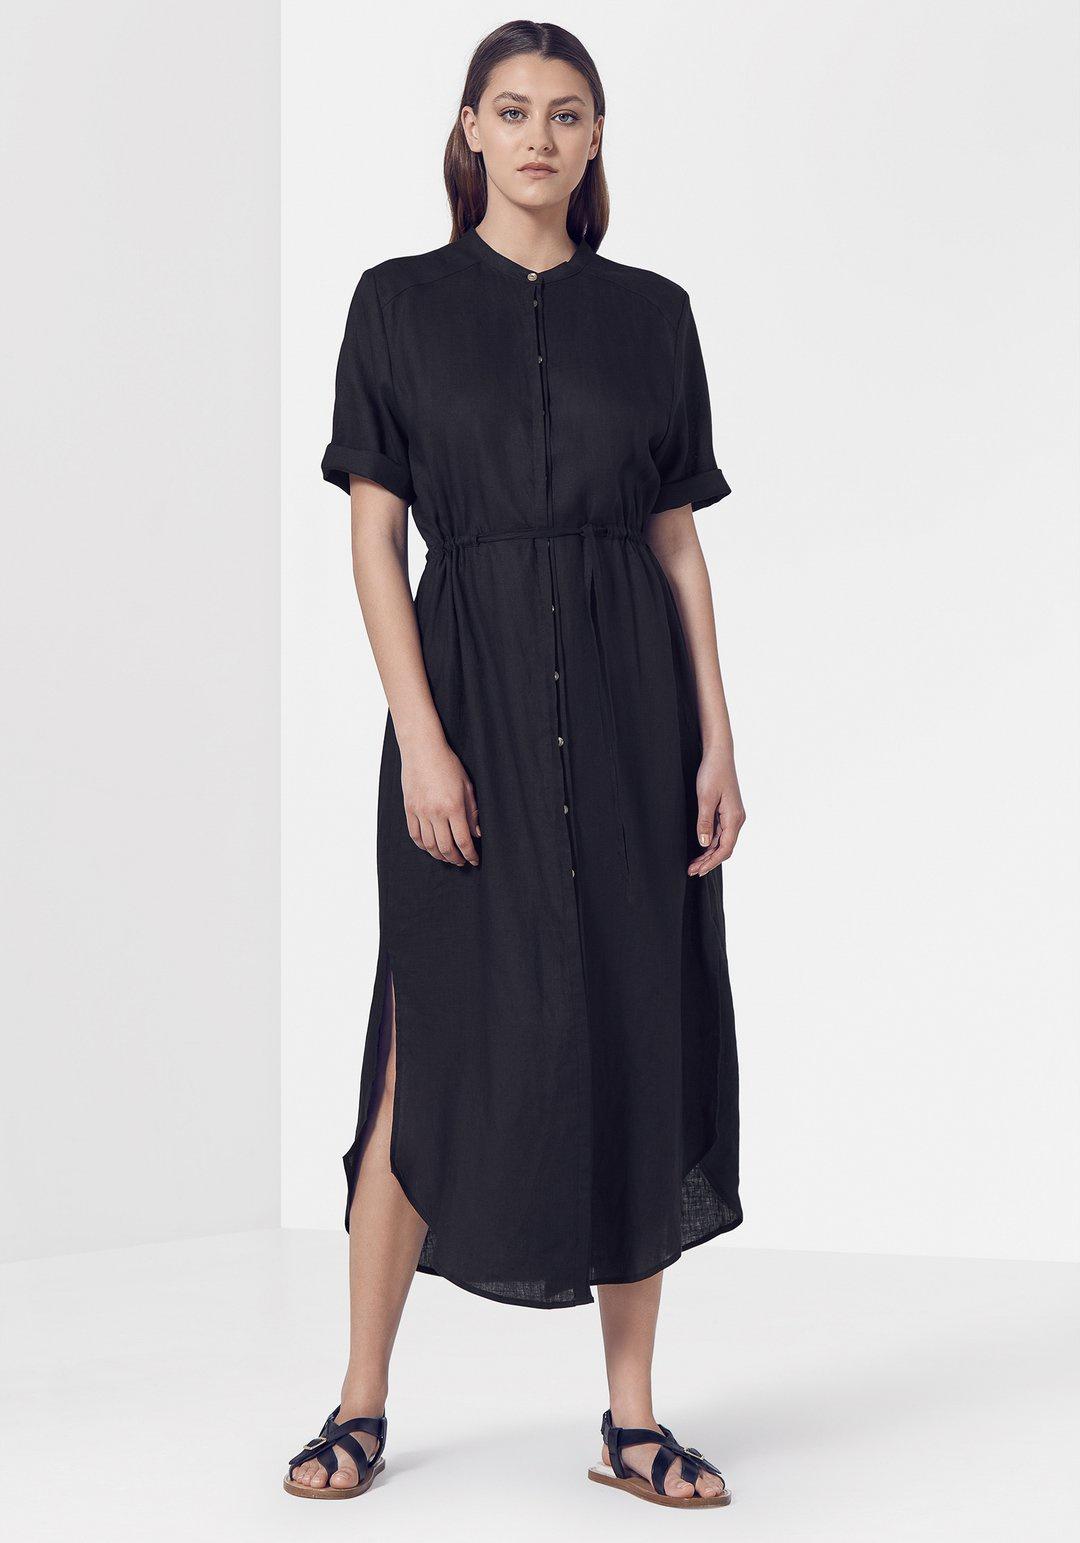 Viktoria & Woods Santorini Dress